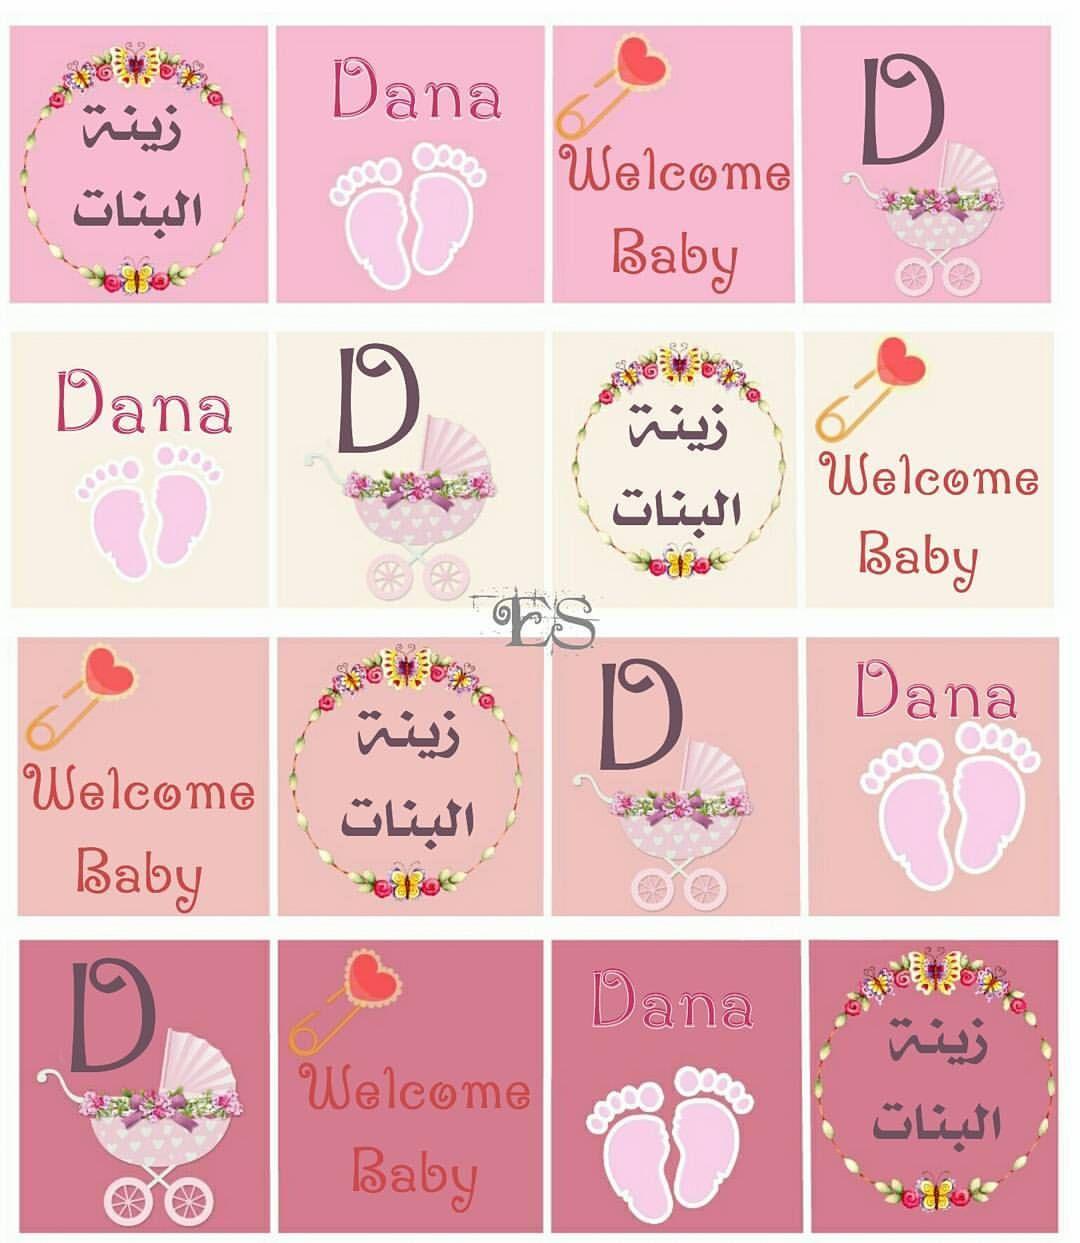 Bdf44d7a7643 ثيم اس قبال مولود مواليد Diy And Crafts Baby Cards